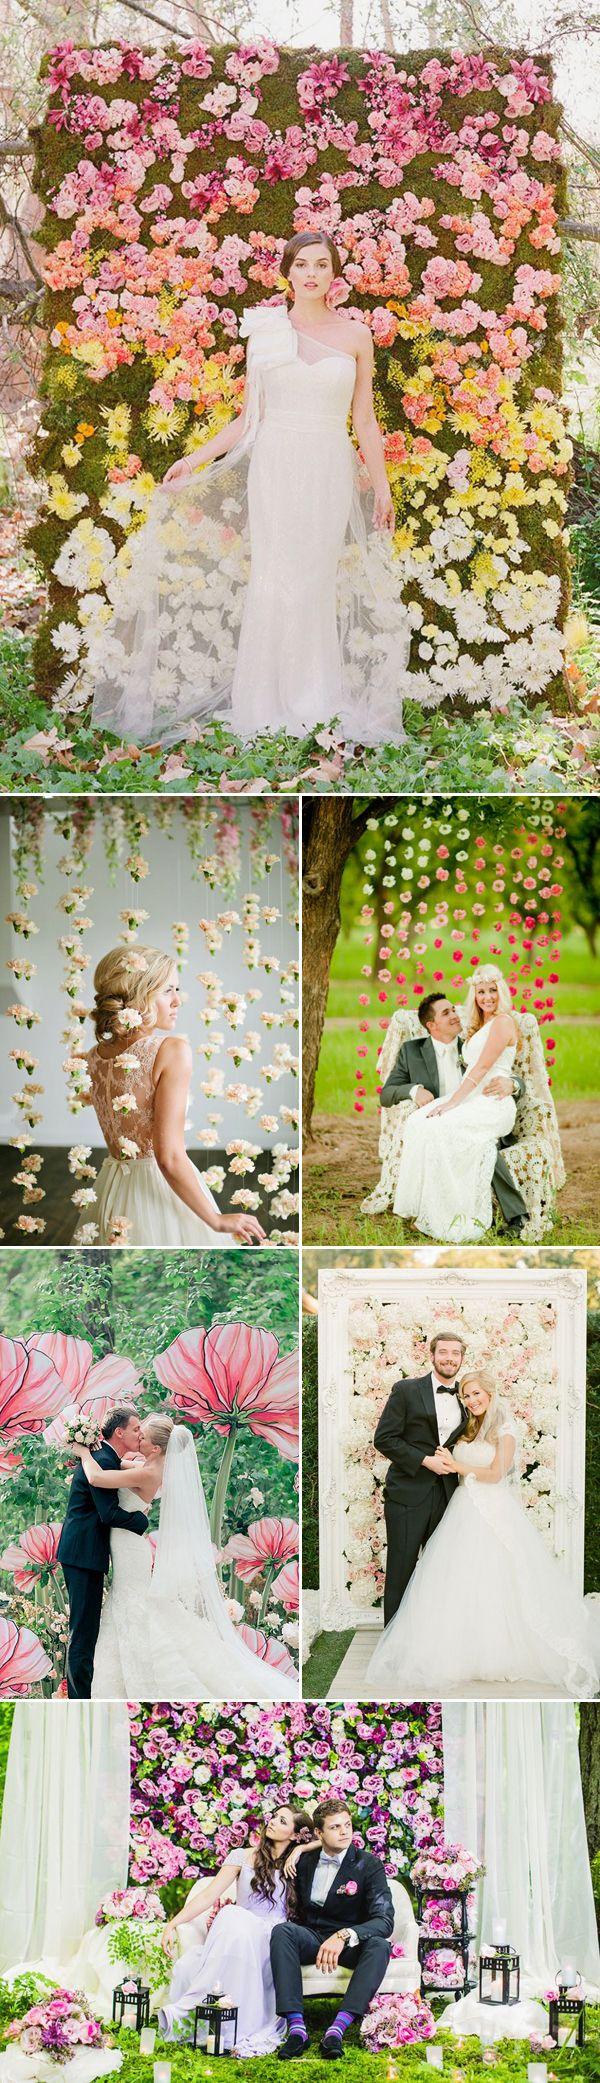 Oh Snap! 45 Creative Wedding Photo Backdrops | Wedding photo ...